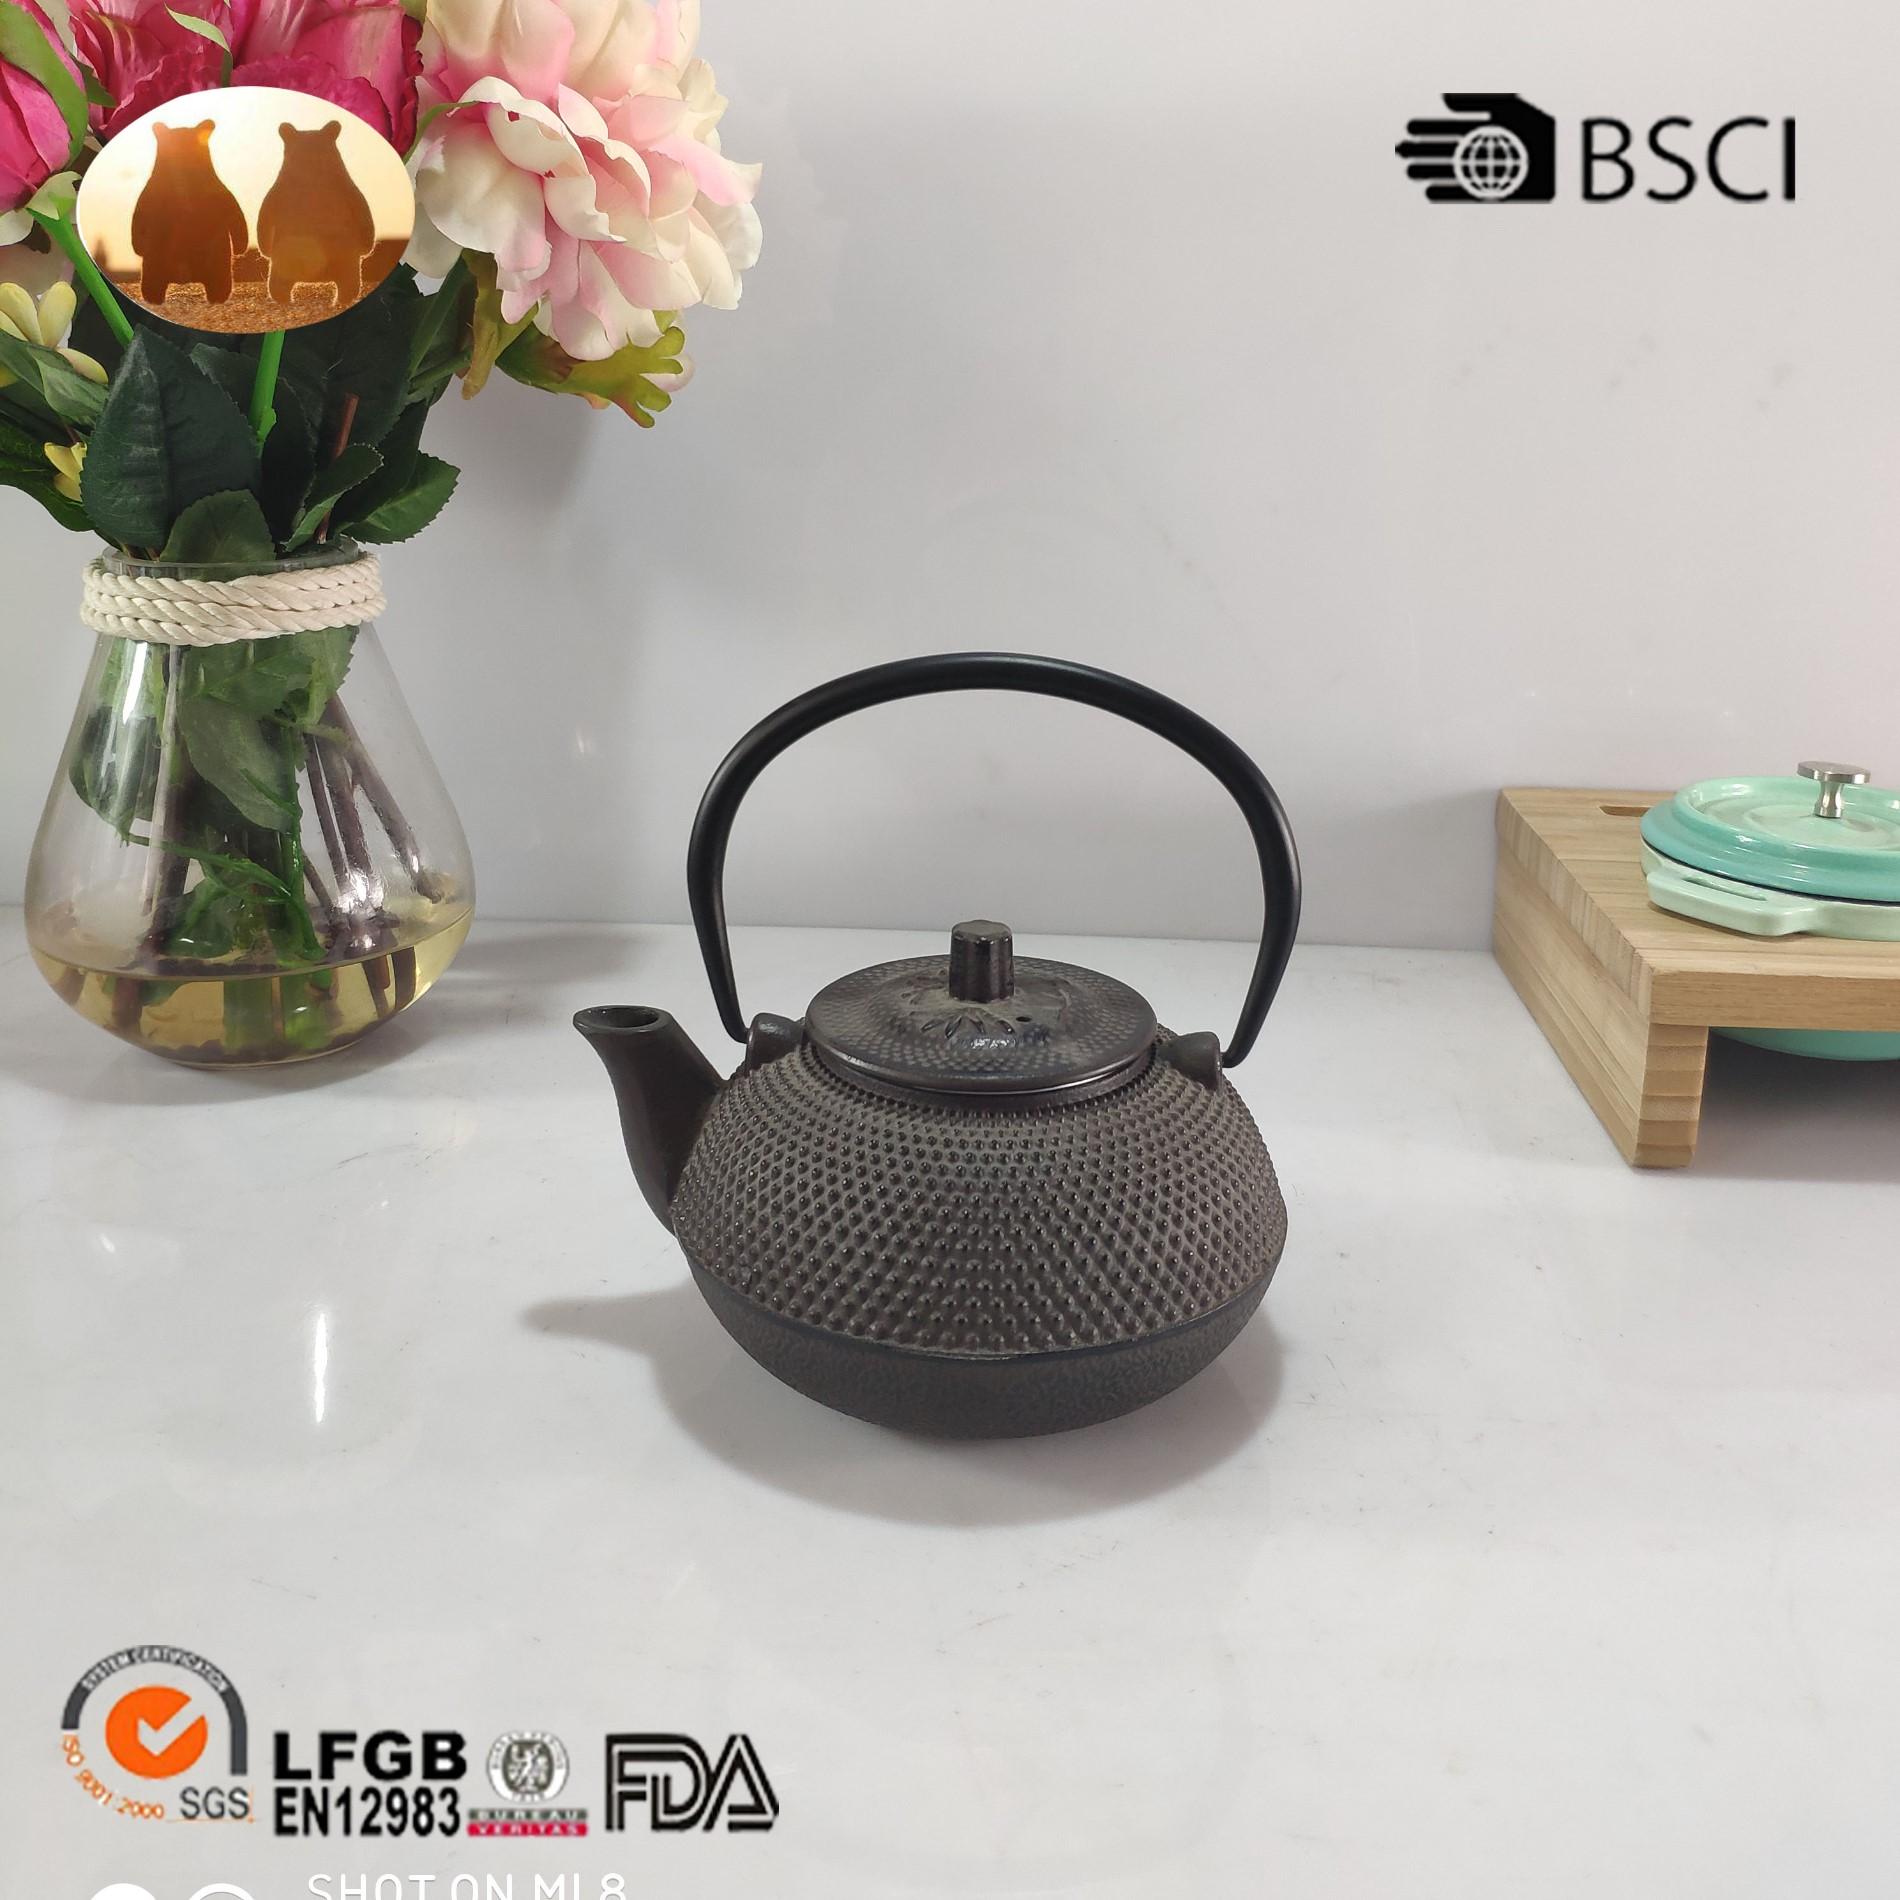 Cast Iron Enamel Tea Pot With Cup Manufacturers, Cast Iron Enamel Tea Pot With Cup Factory, Supply Cast Iron Enamel Tea Pot With Cup